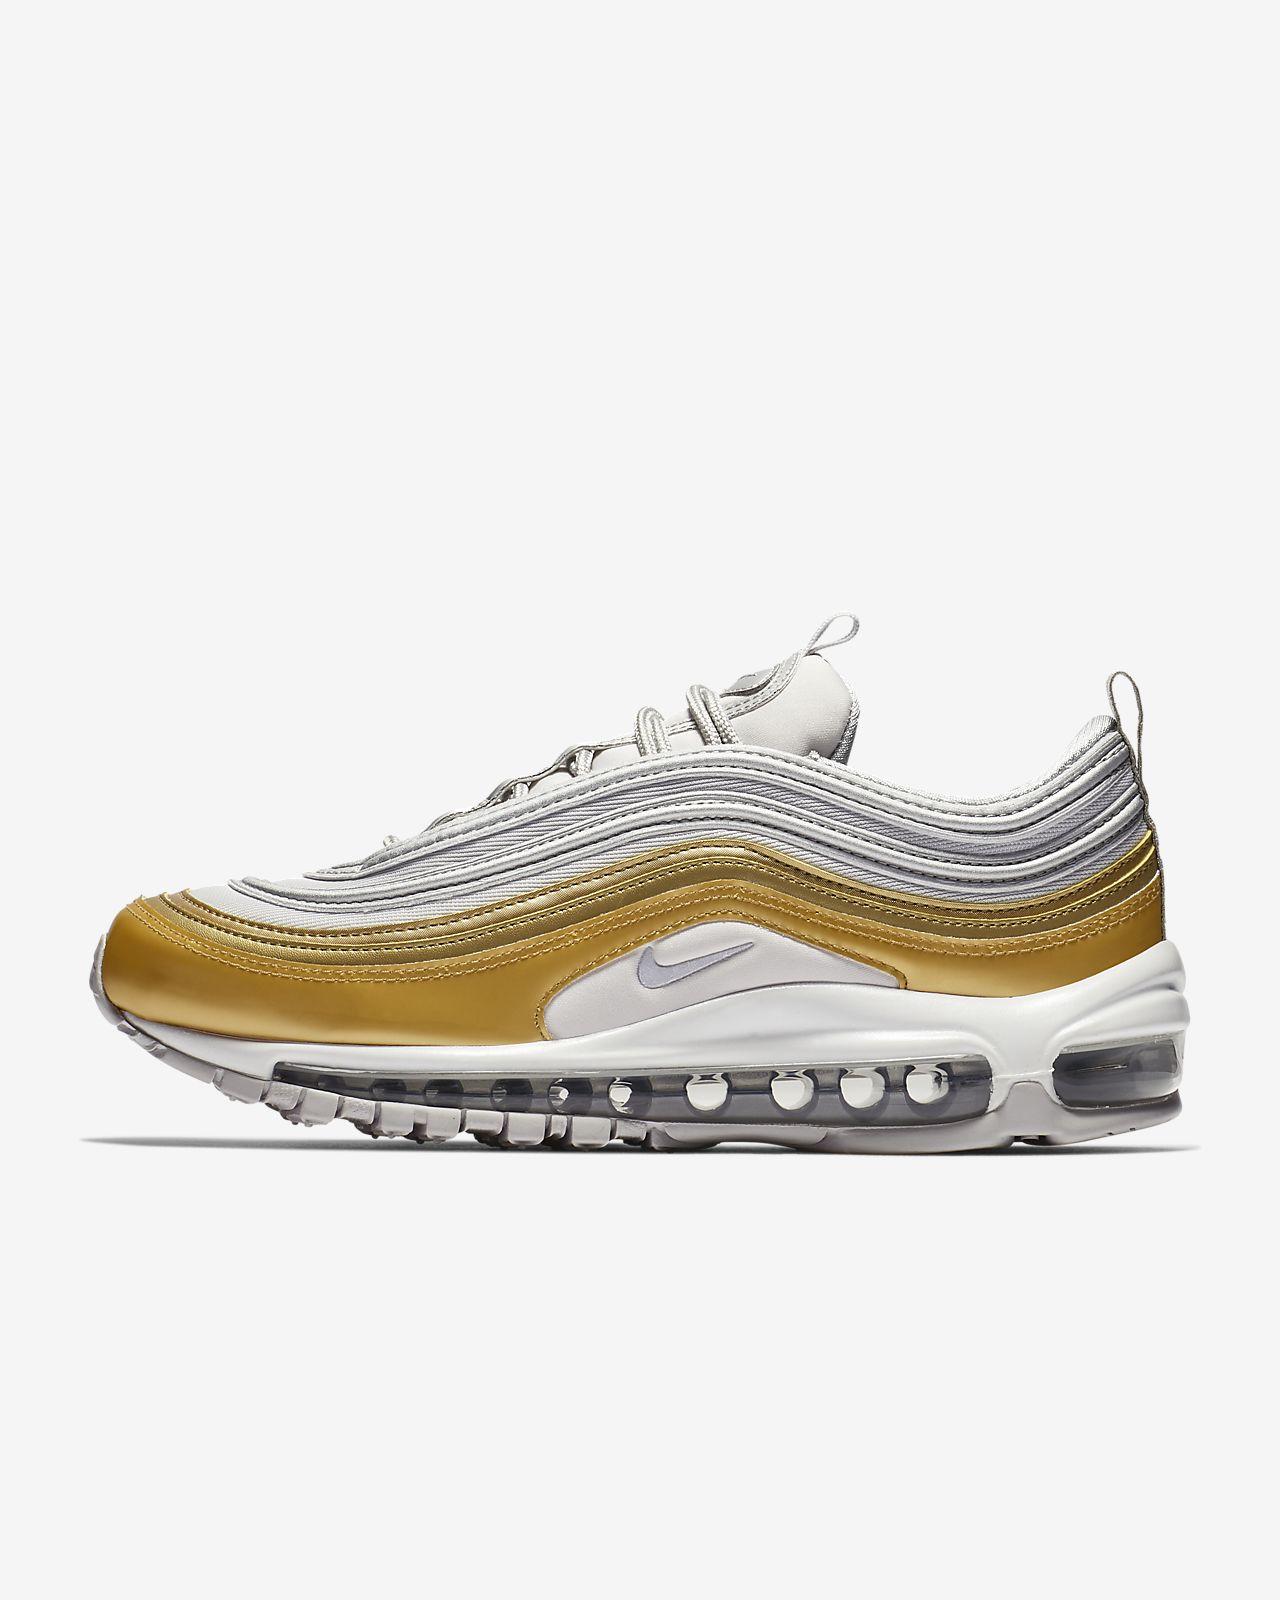 Nike Air Max 97 SE Metallic Women's Shoe